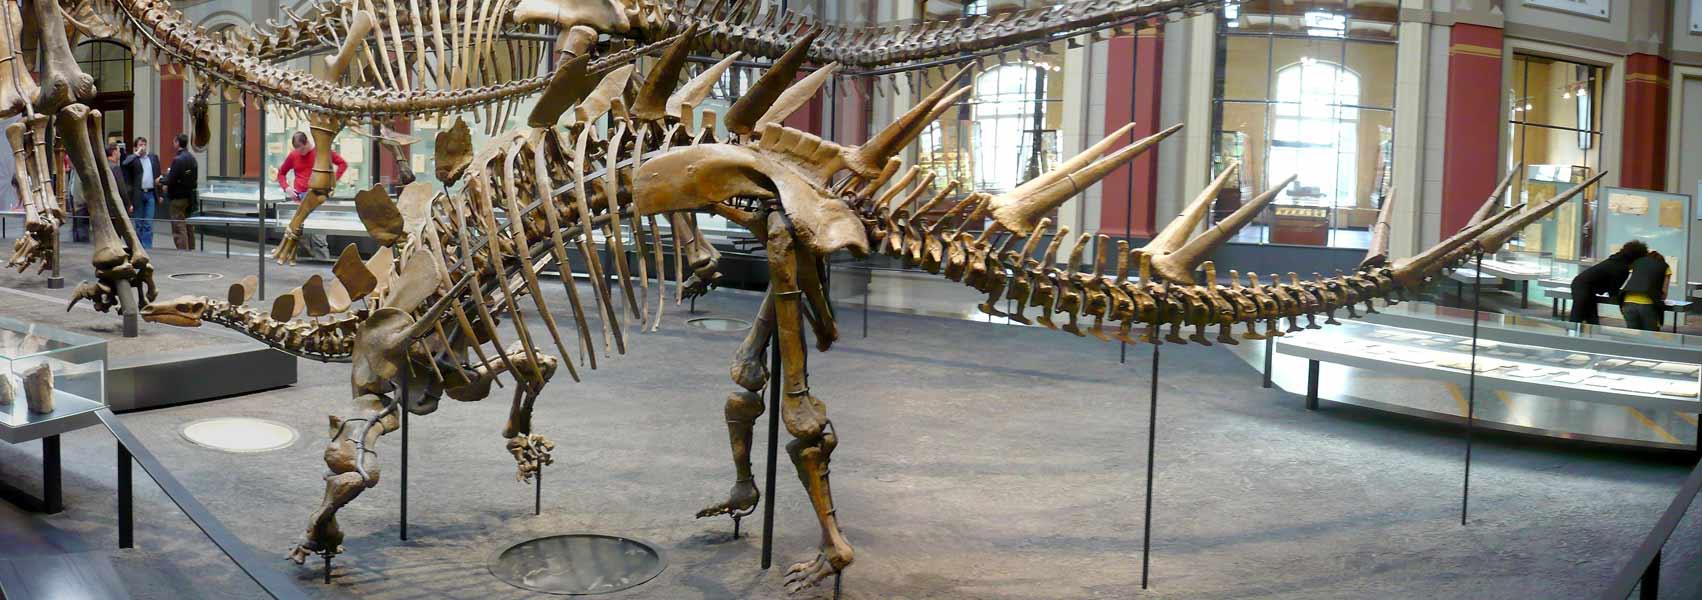 kentrosauruspanoweb.jpg